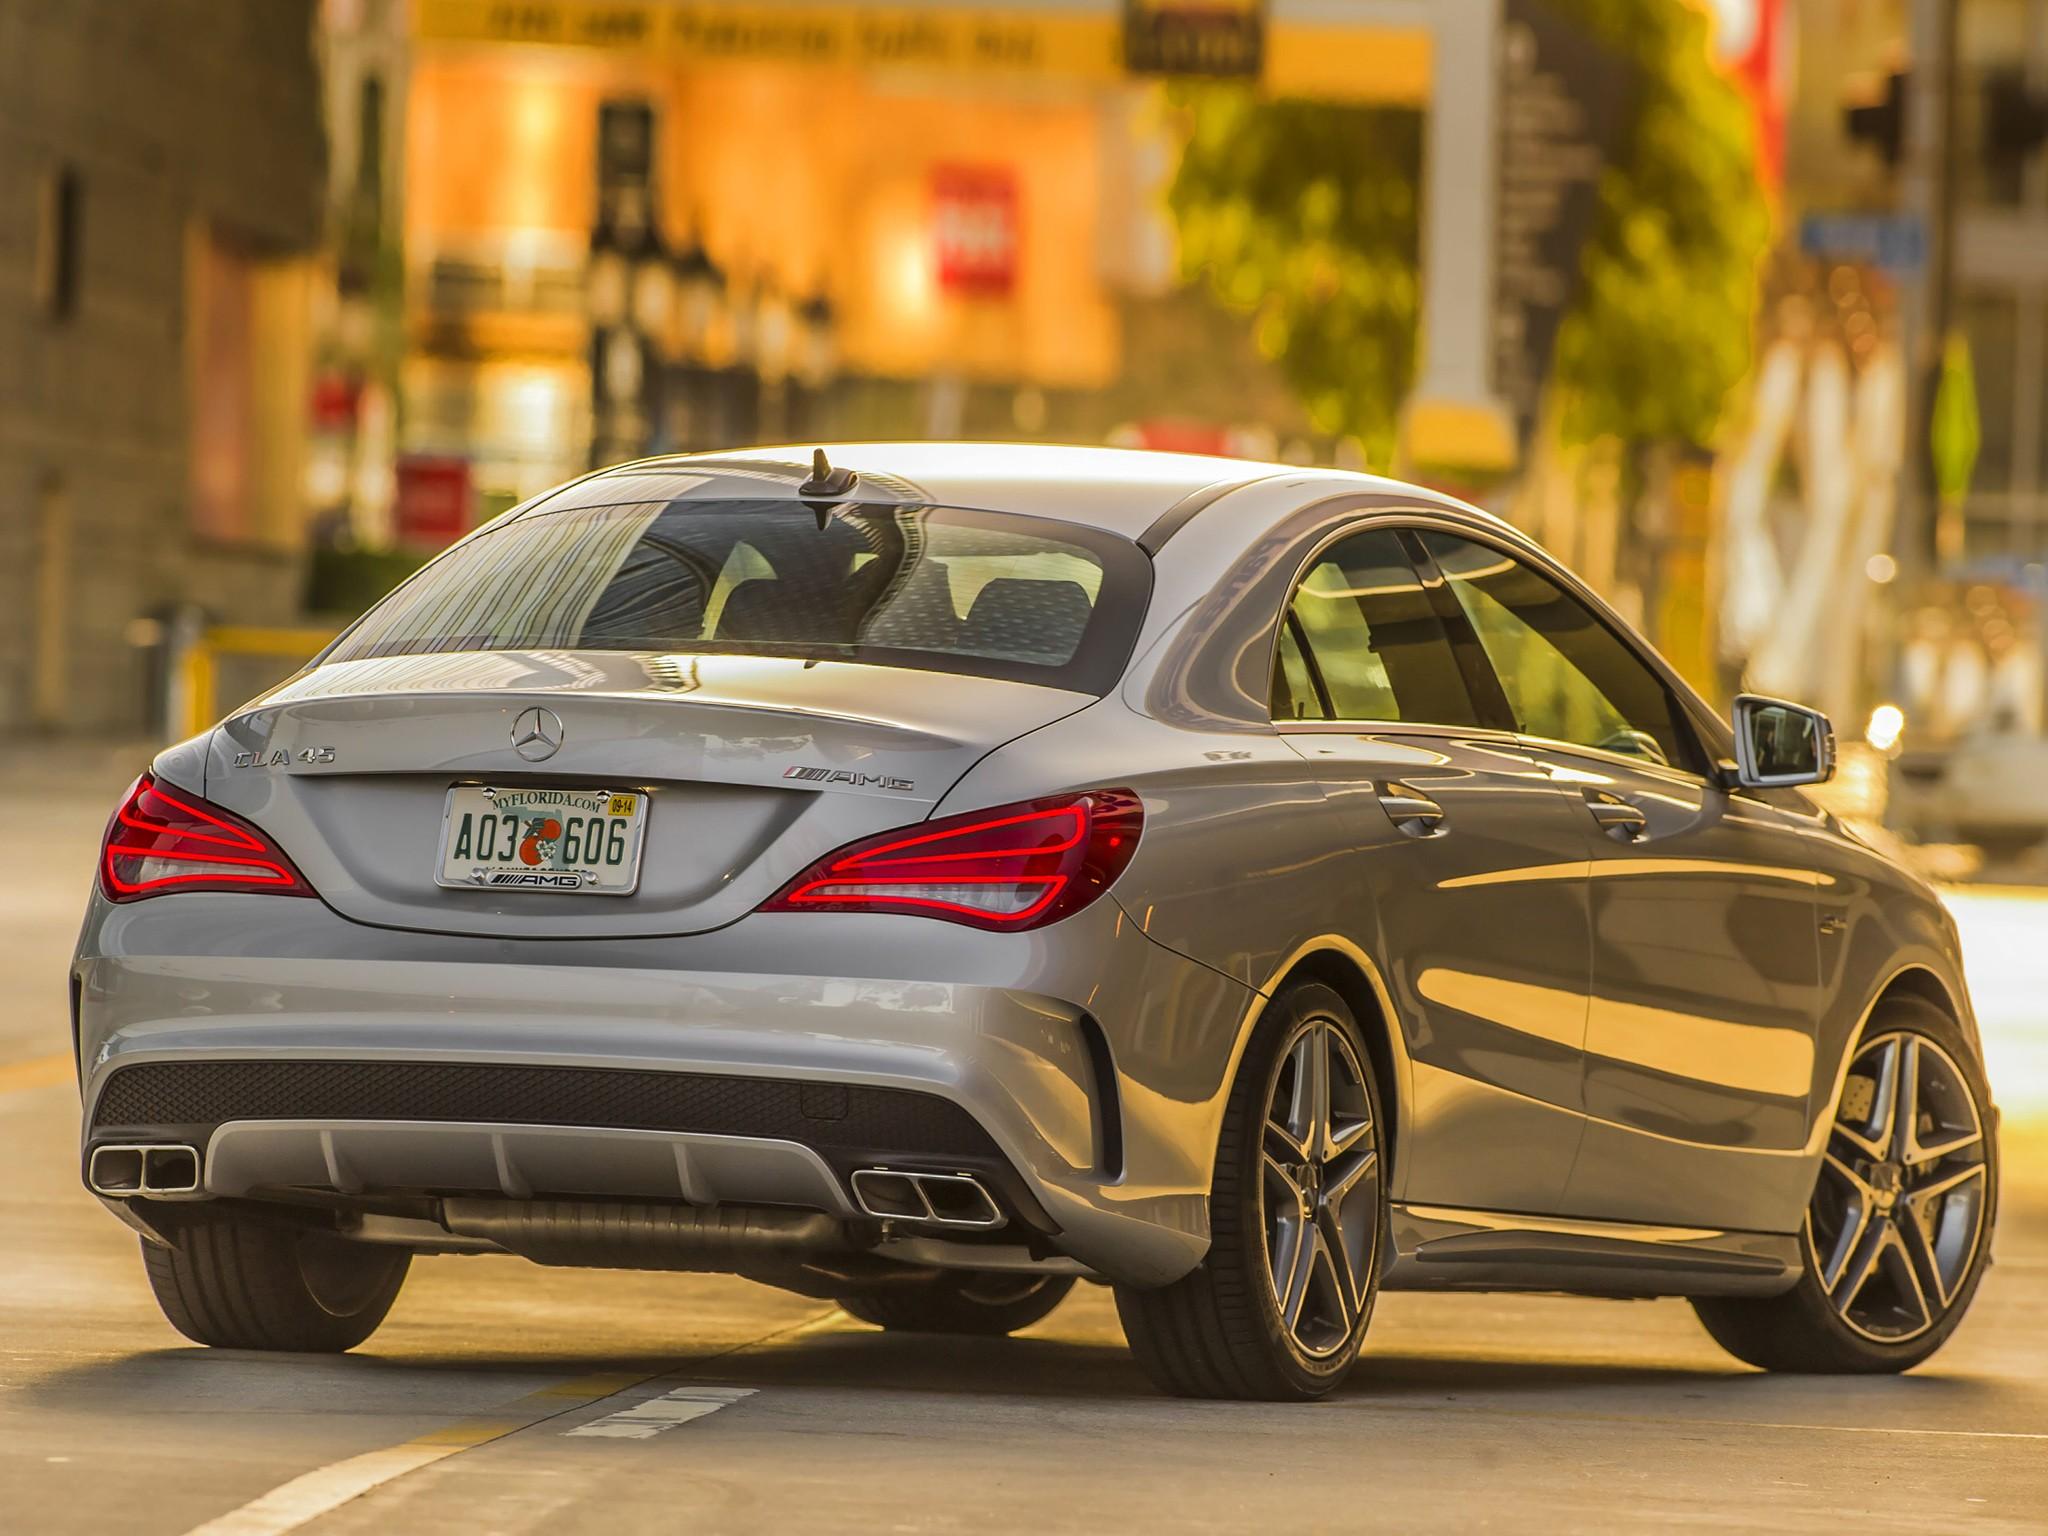 Mercedes benz cla 45 c117 specs 2013 2014 2015 2016 for Www mercedes benz usa